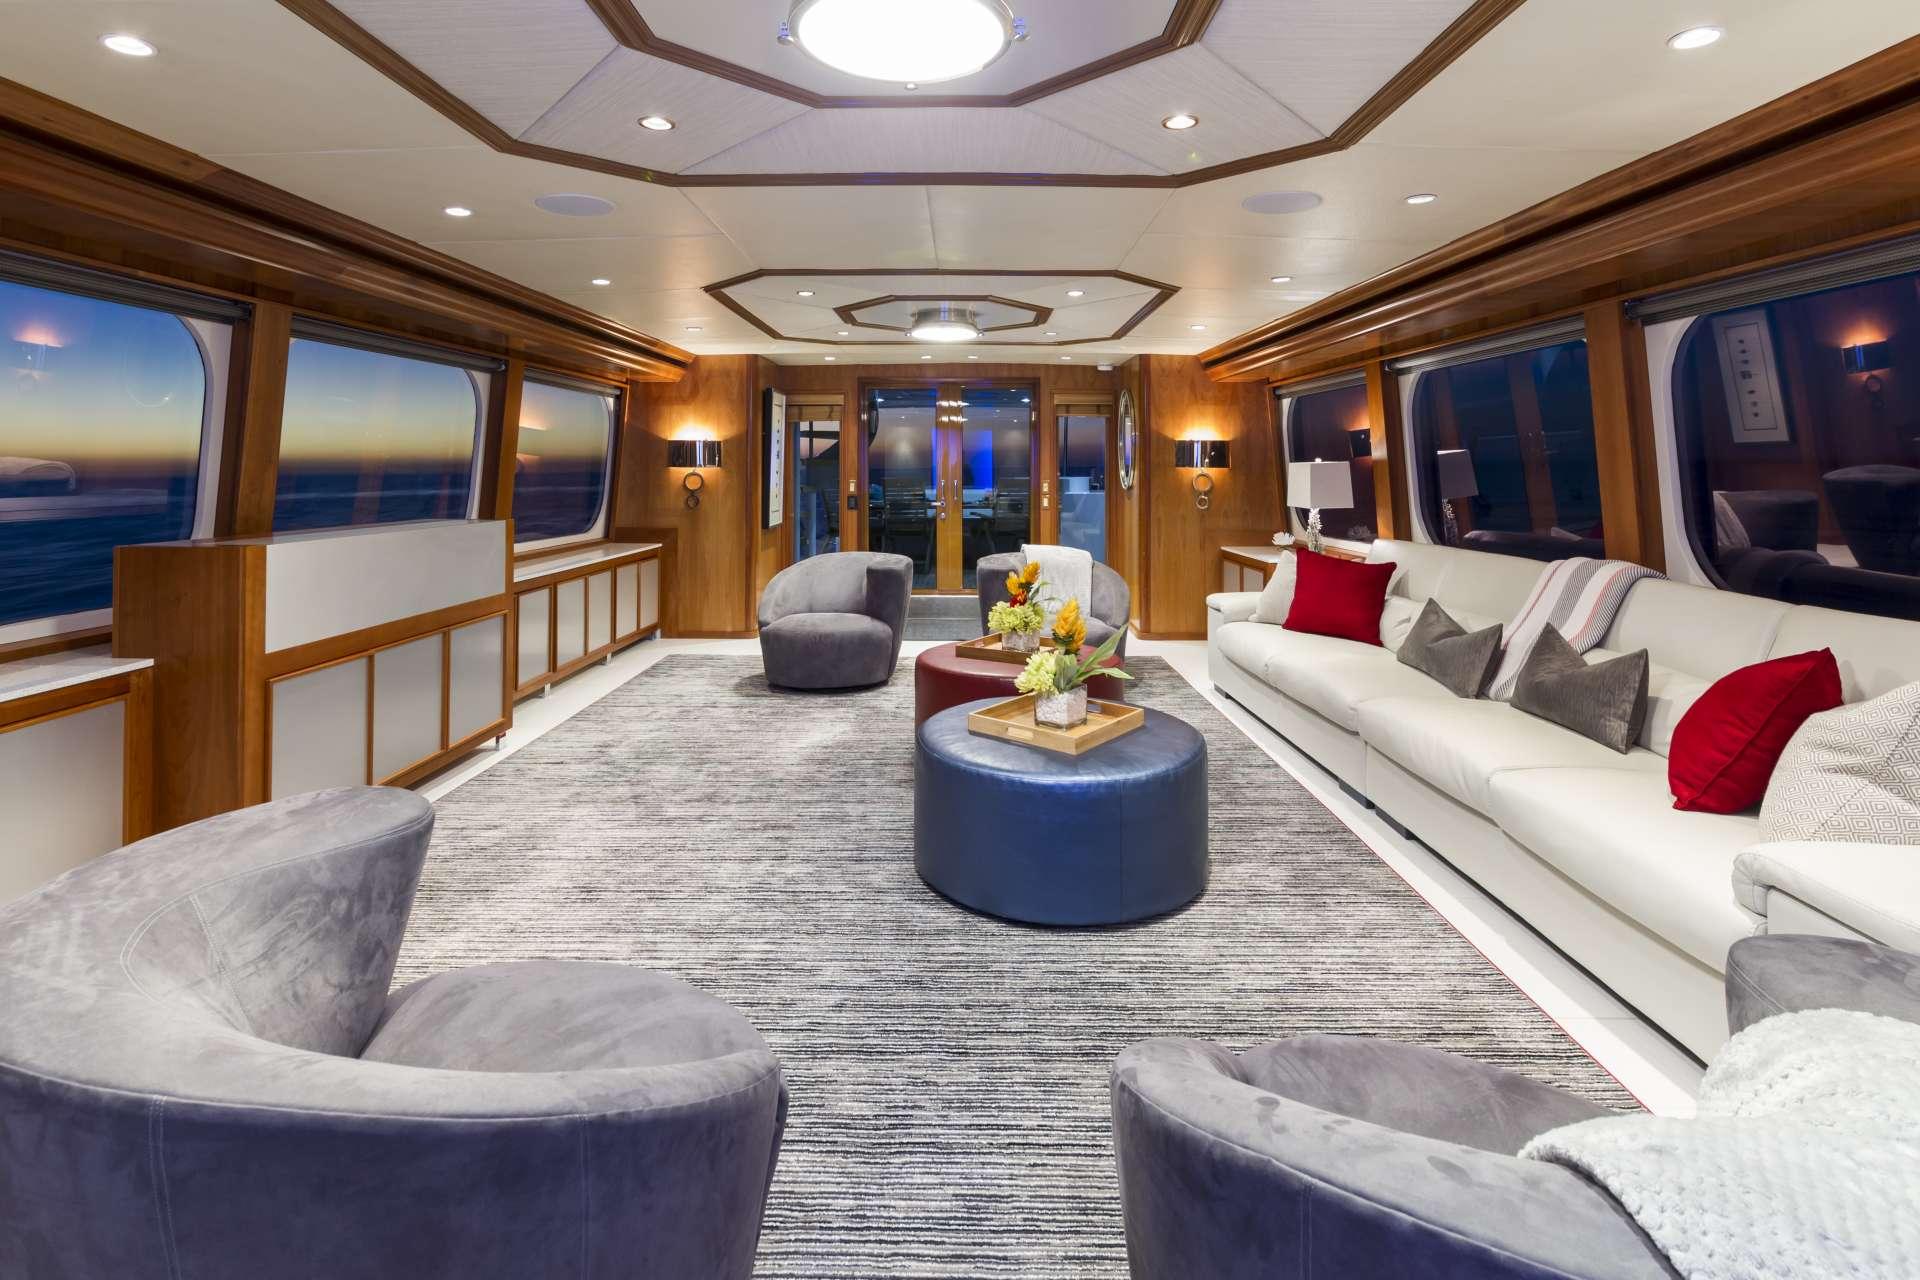 Power Yacht 'Power', 8 PAX, 4 Crew, 110.00 Ft, 33.00 Meters, Built 2004, Broward, Refit Year 2016/17